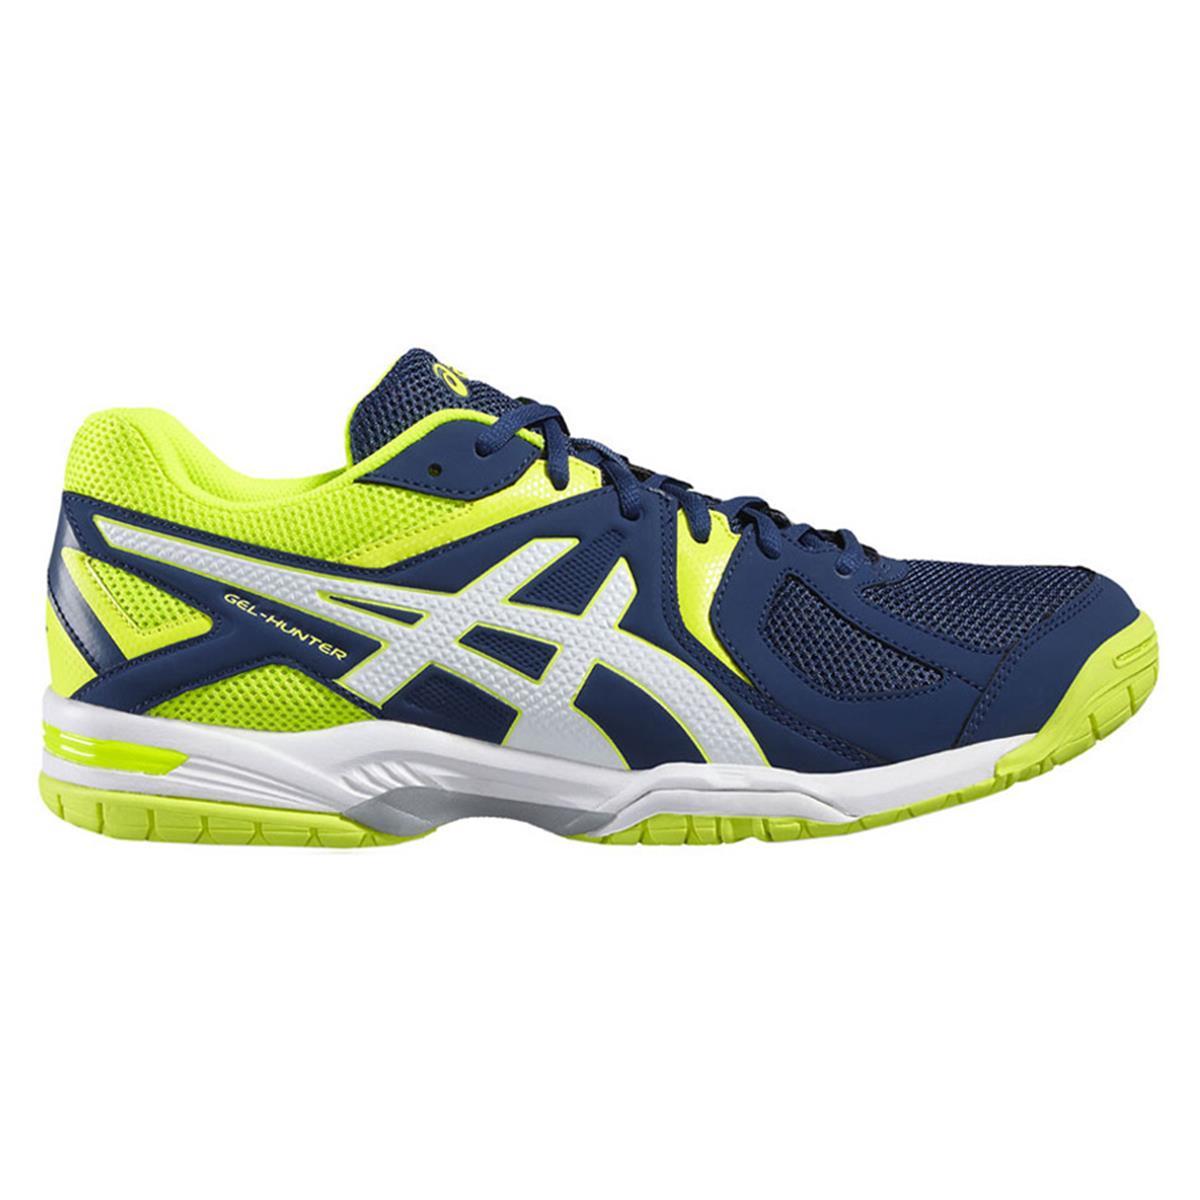 outlet na sprzedaż kolejna szansa całkiem fajne Asics Gel Hunter 3 Mens Court Shoes (Poseidon-White-Safety Yellow) | Direct  Squash